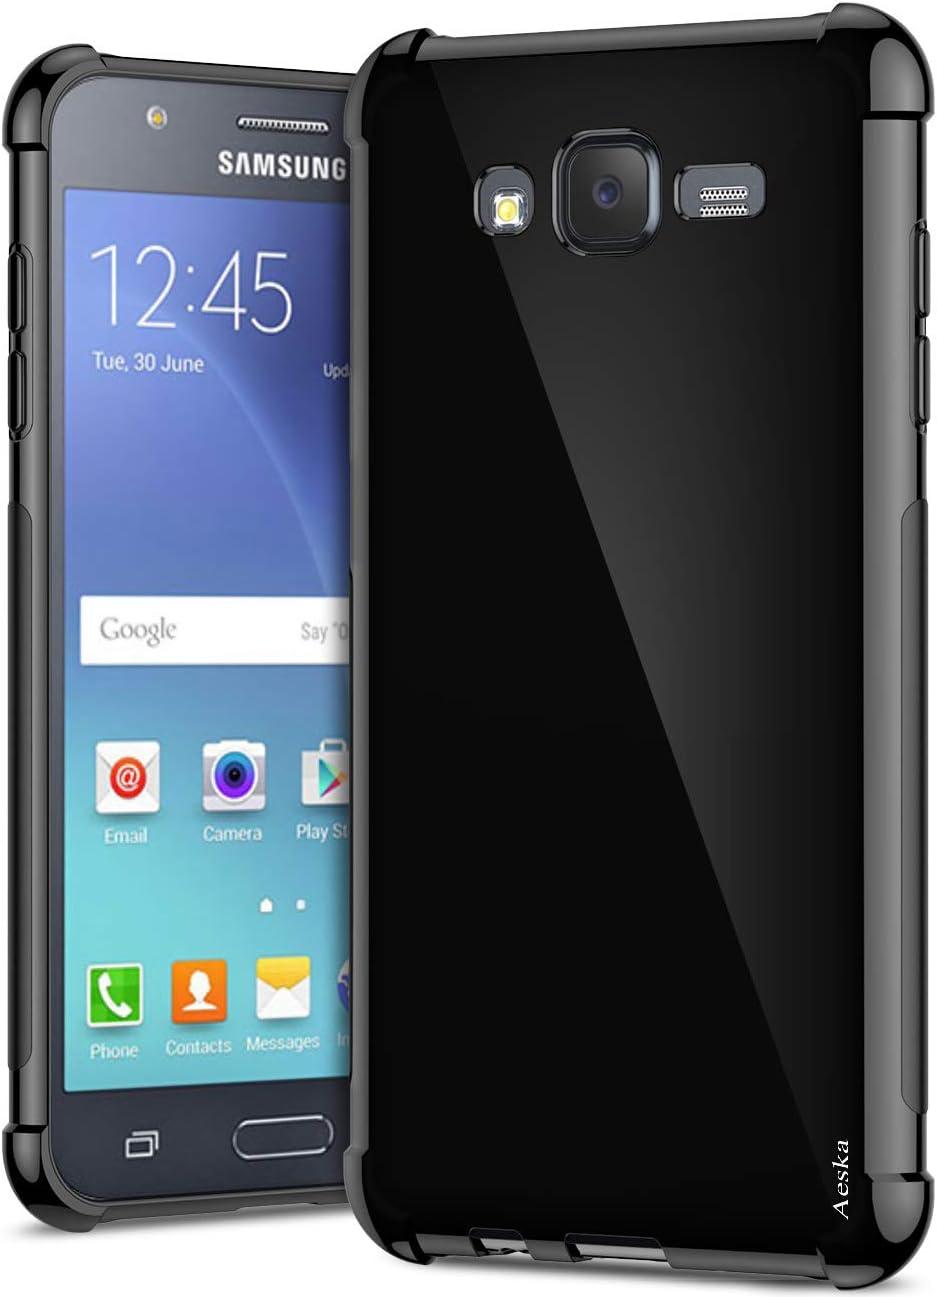 Galaxy J7 Case, Aeska Ultra [Slim Thin] Flexible TPU Gel Rubber [Shockproof] [Corner Cushion] Shock Resistant Slim TPU Soft Skin Silicone Protective Bumper Case Cover for Samsung Galaxy J7 2015(Black)